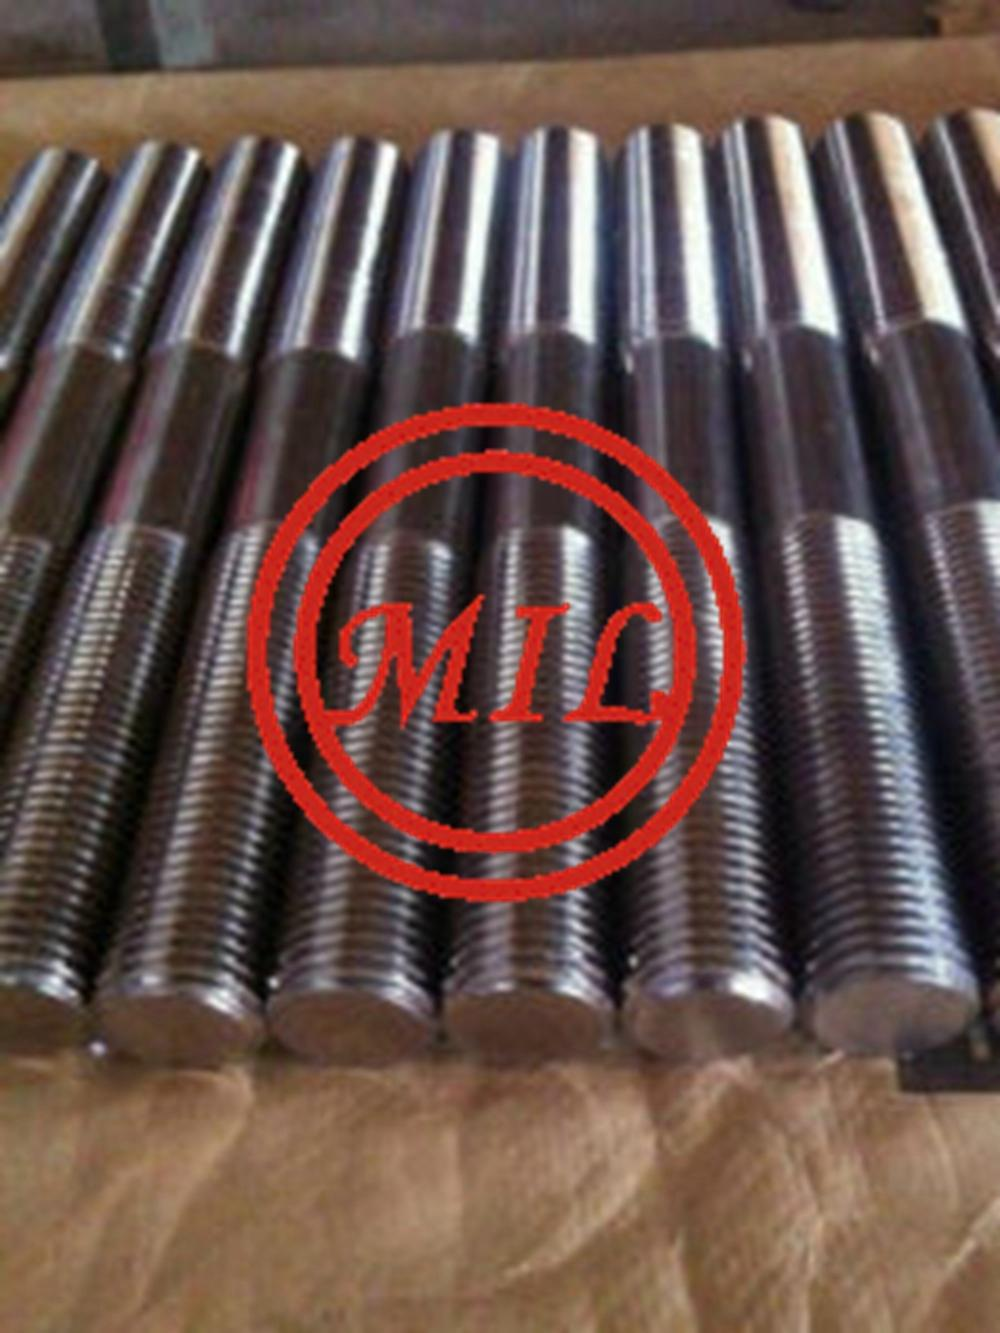 ASTM F468/F468M UNS N06625 Inconel 625 Bolts, Stud Bolts